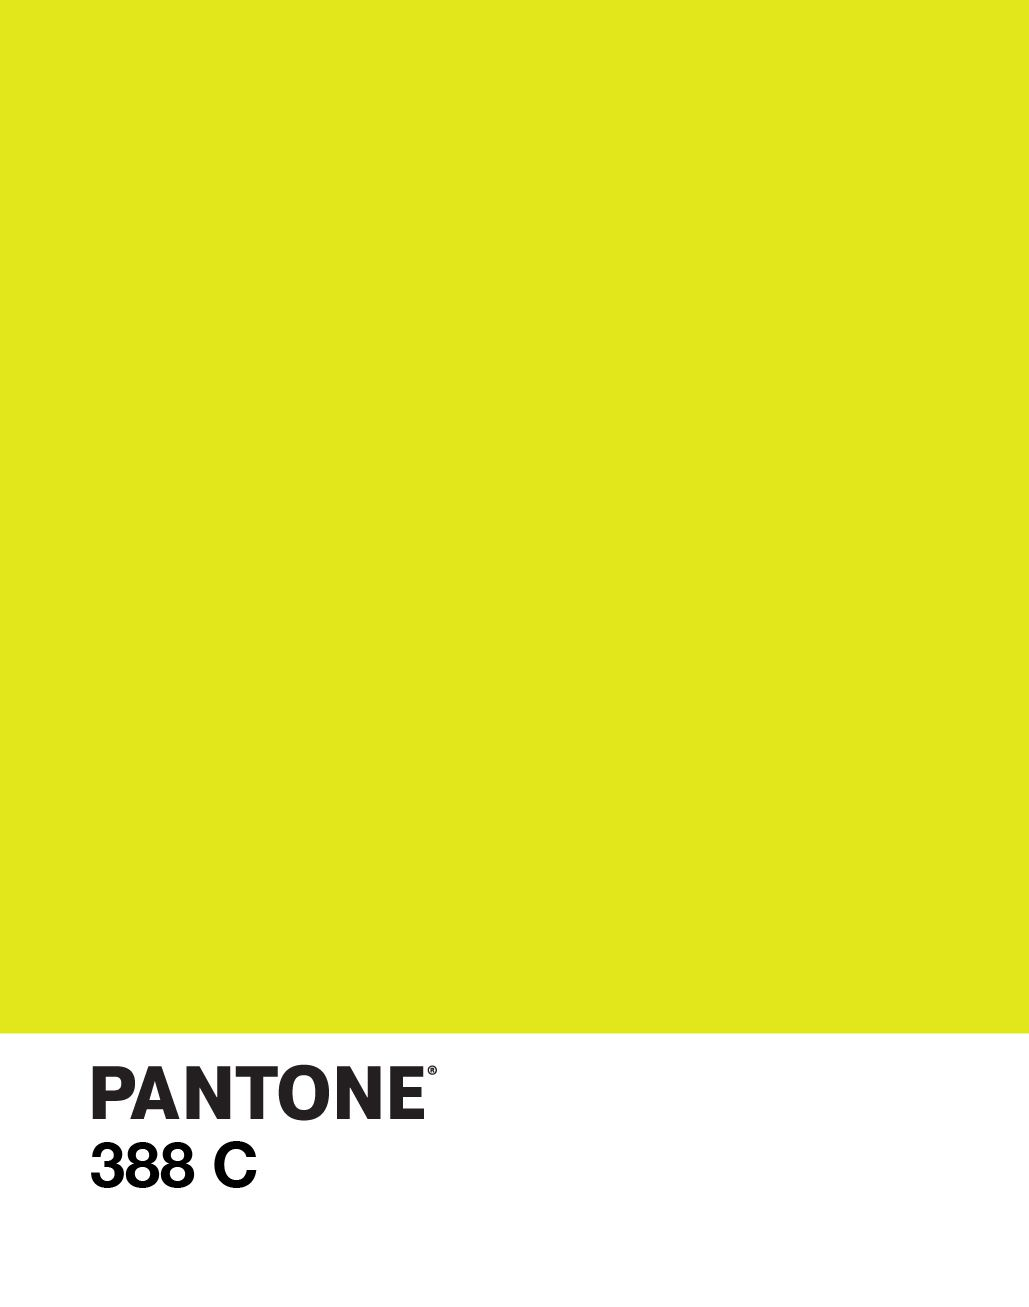 PANTONE 388 C / color / yellow-green / design | P A N T O ...